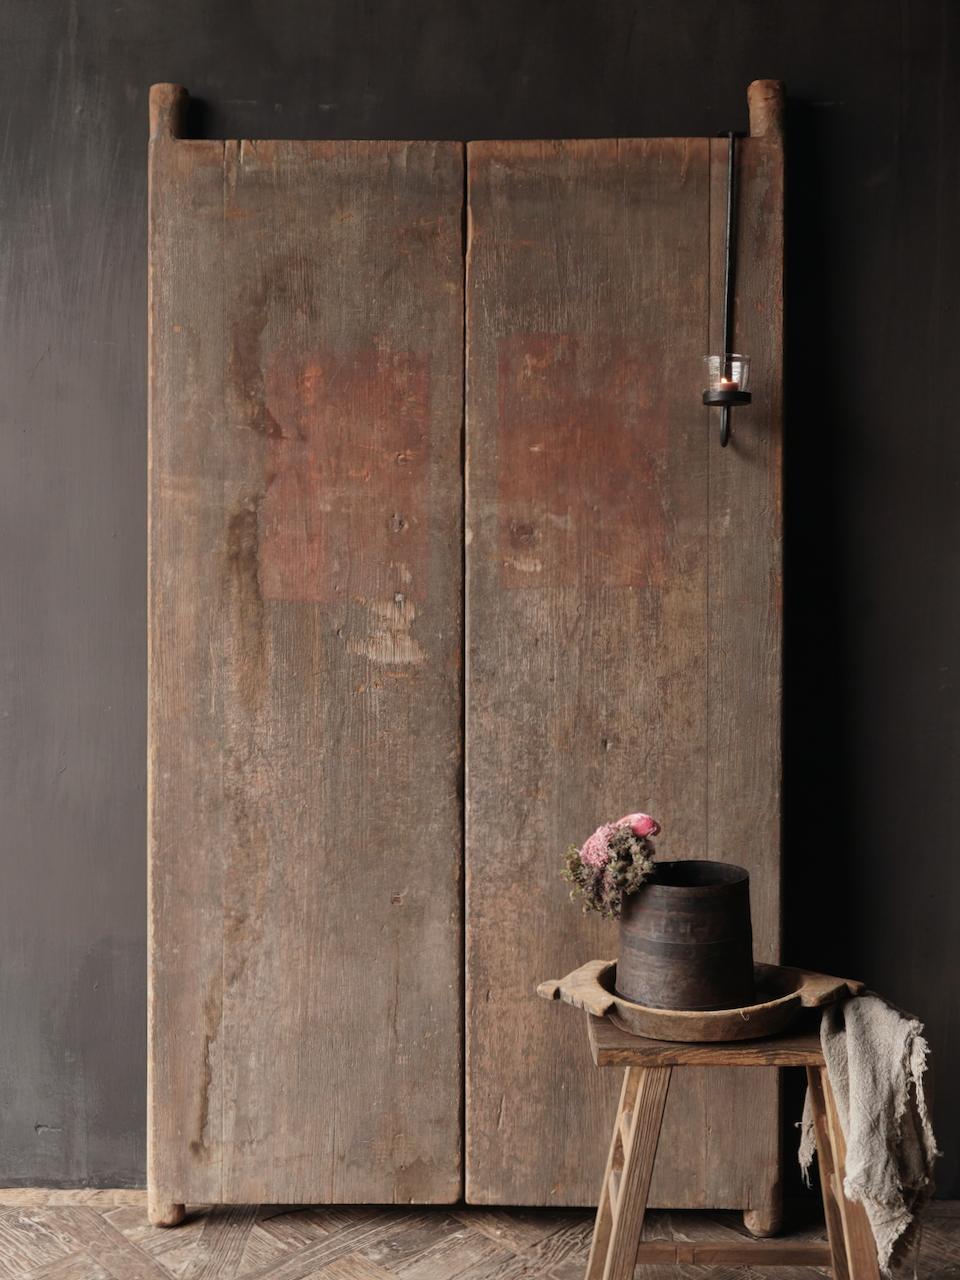 Old Indian doors set-1